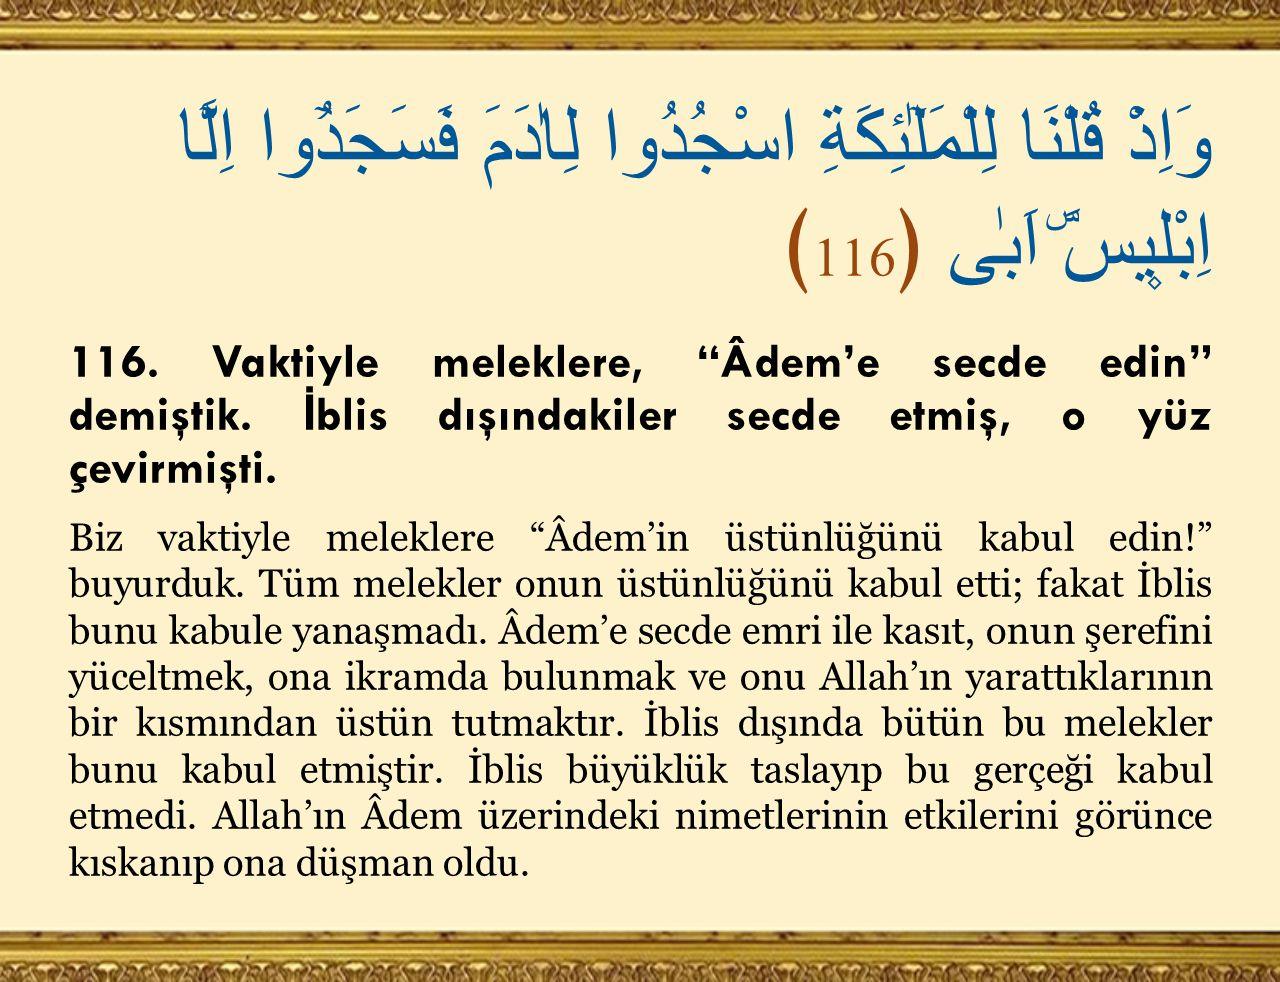 "وَاِذْ قُلْنَا لِلْمَلٰٓئِكَةِ اسْجُدُوا لِاٰدَمَ فَسَجَدُٓوا اِلَّٓا اِبْل۪يسَۜ اَبٰى ﴿ 116 ﴾ 116. Vaktiyle meleklere, ""Âdem'e secde edin"" demiştik."